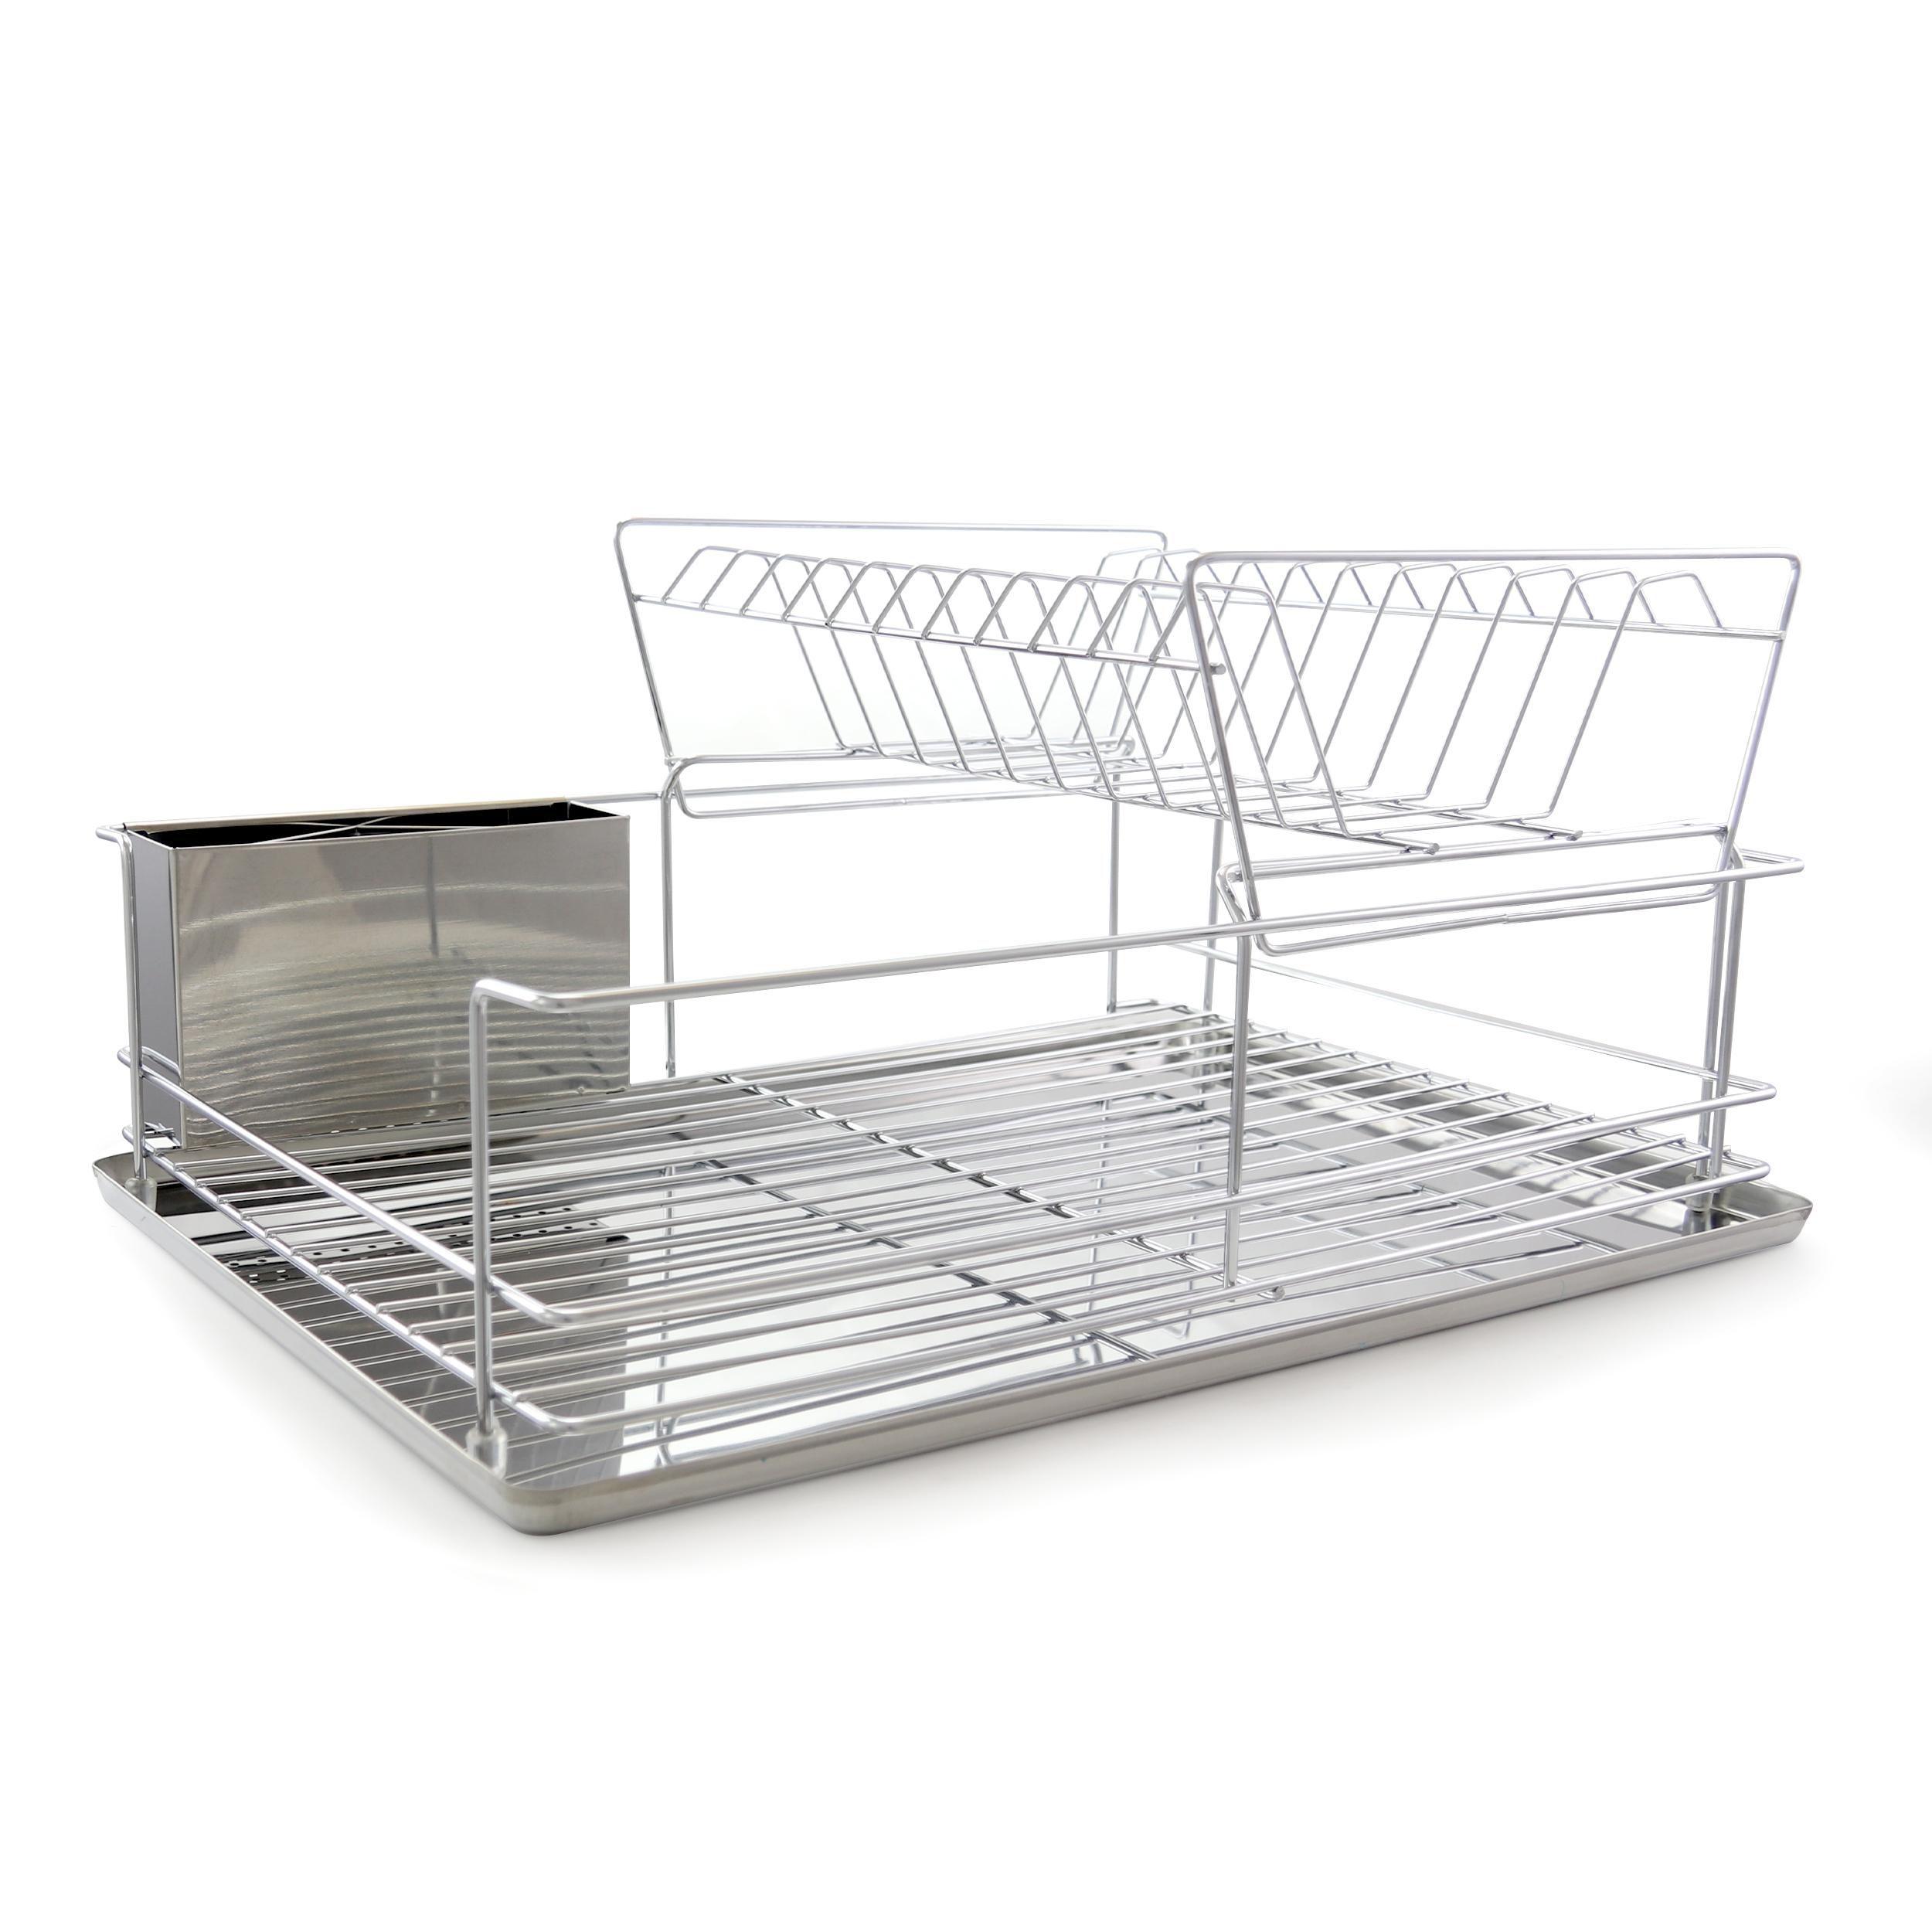 "Better Chef 4 Piece 18.5"" Dish Drying Rack Set"